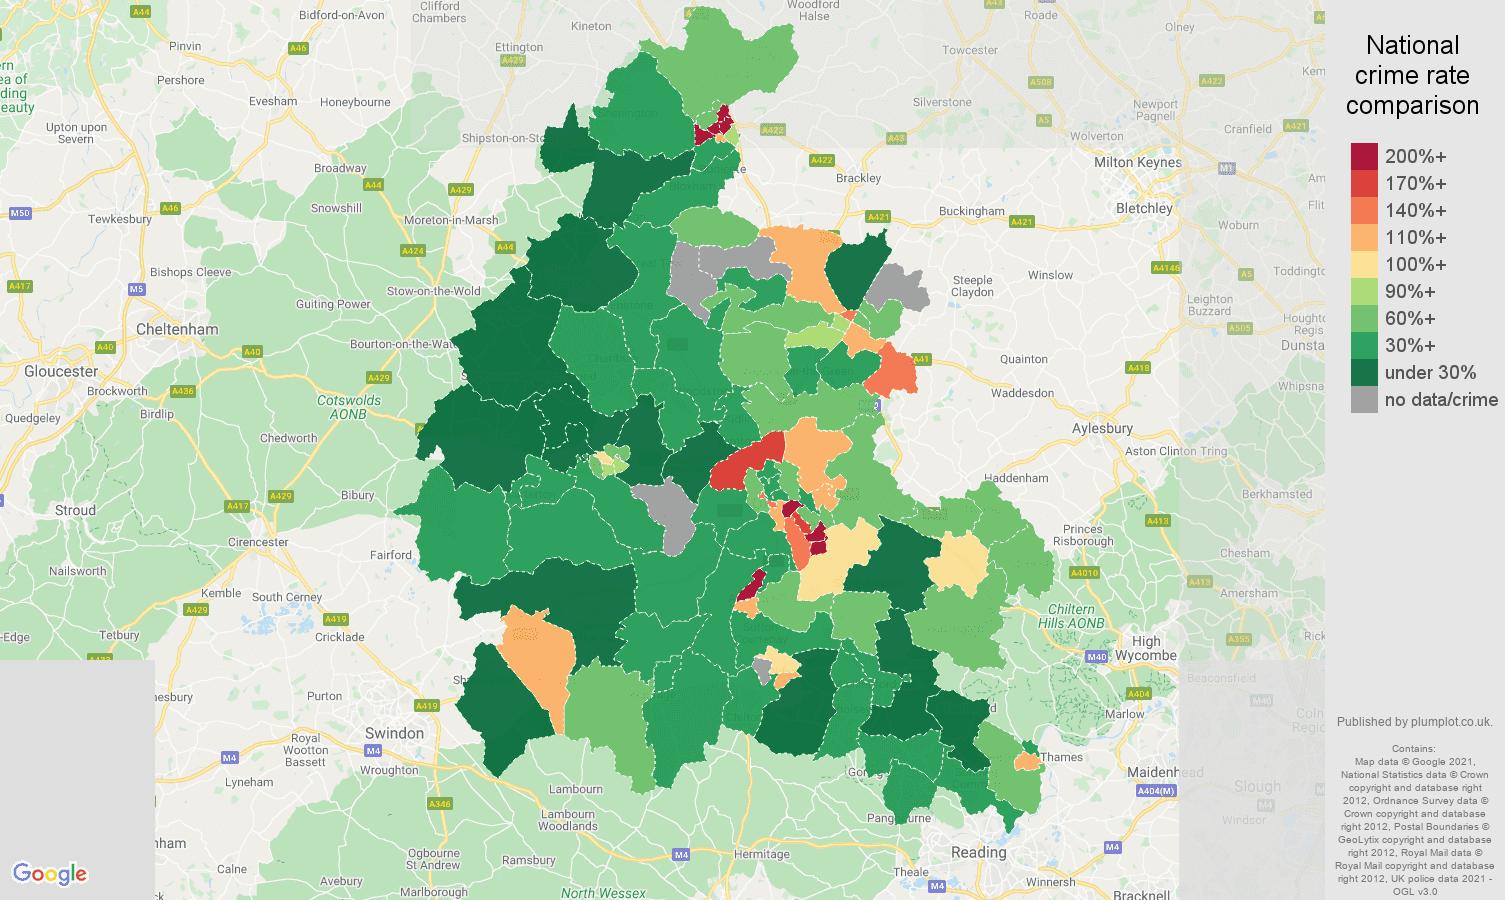 Oxfordshire drugs crime rate comparison map